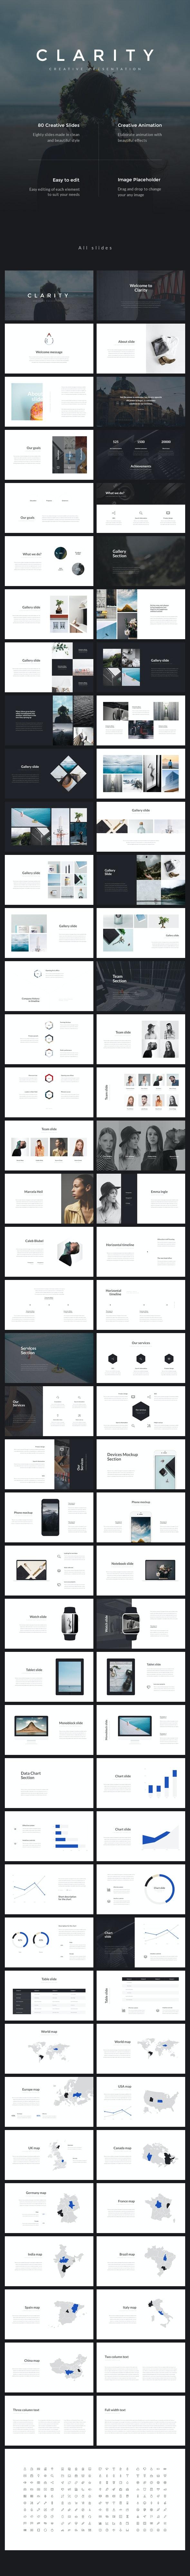 Clarity PowerPoint Presentation - PowerPoint Templates Presentation Templates